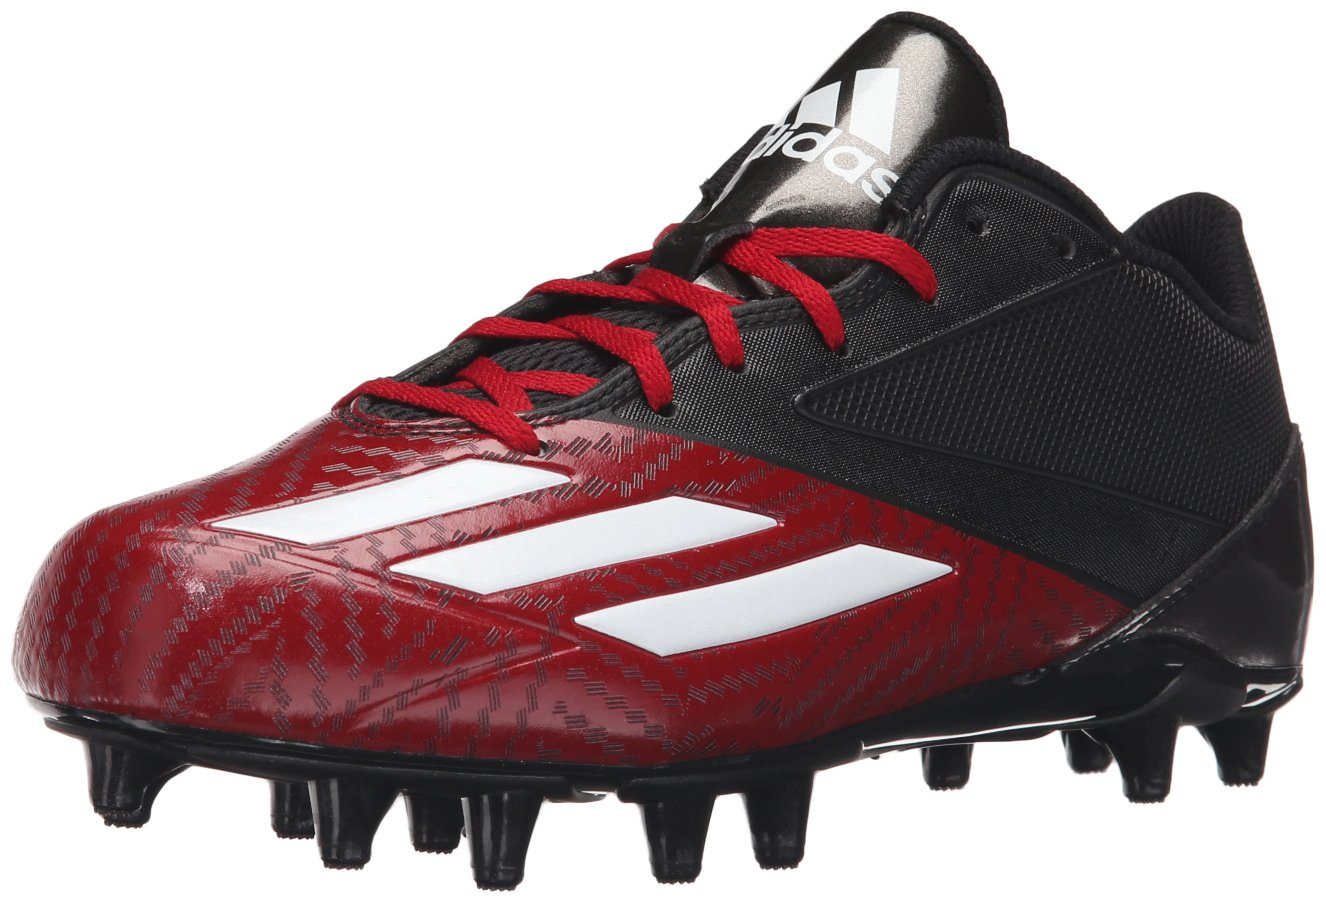 adidas Originals Men's 5-Star Low Football Shoe B0163G9Y10 7.5 D(M) US|Black/White/University Red